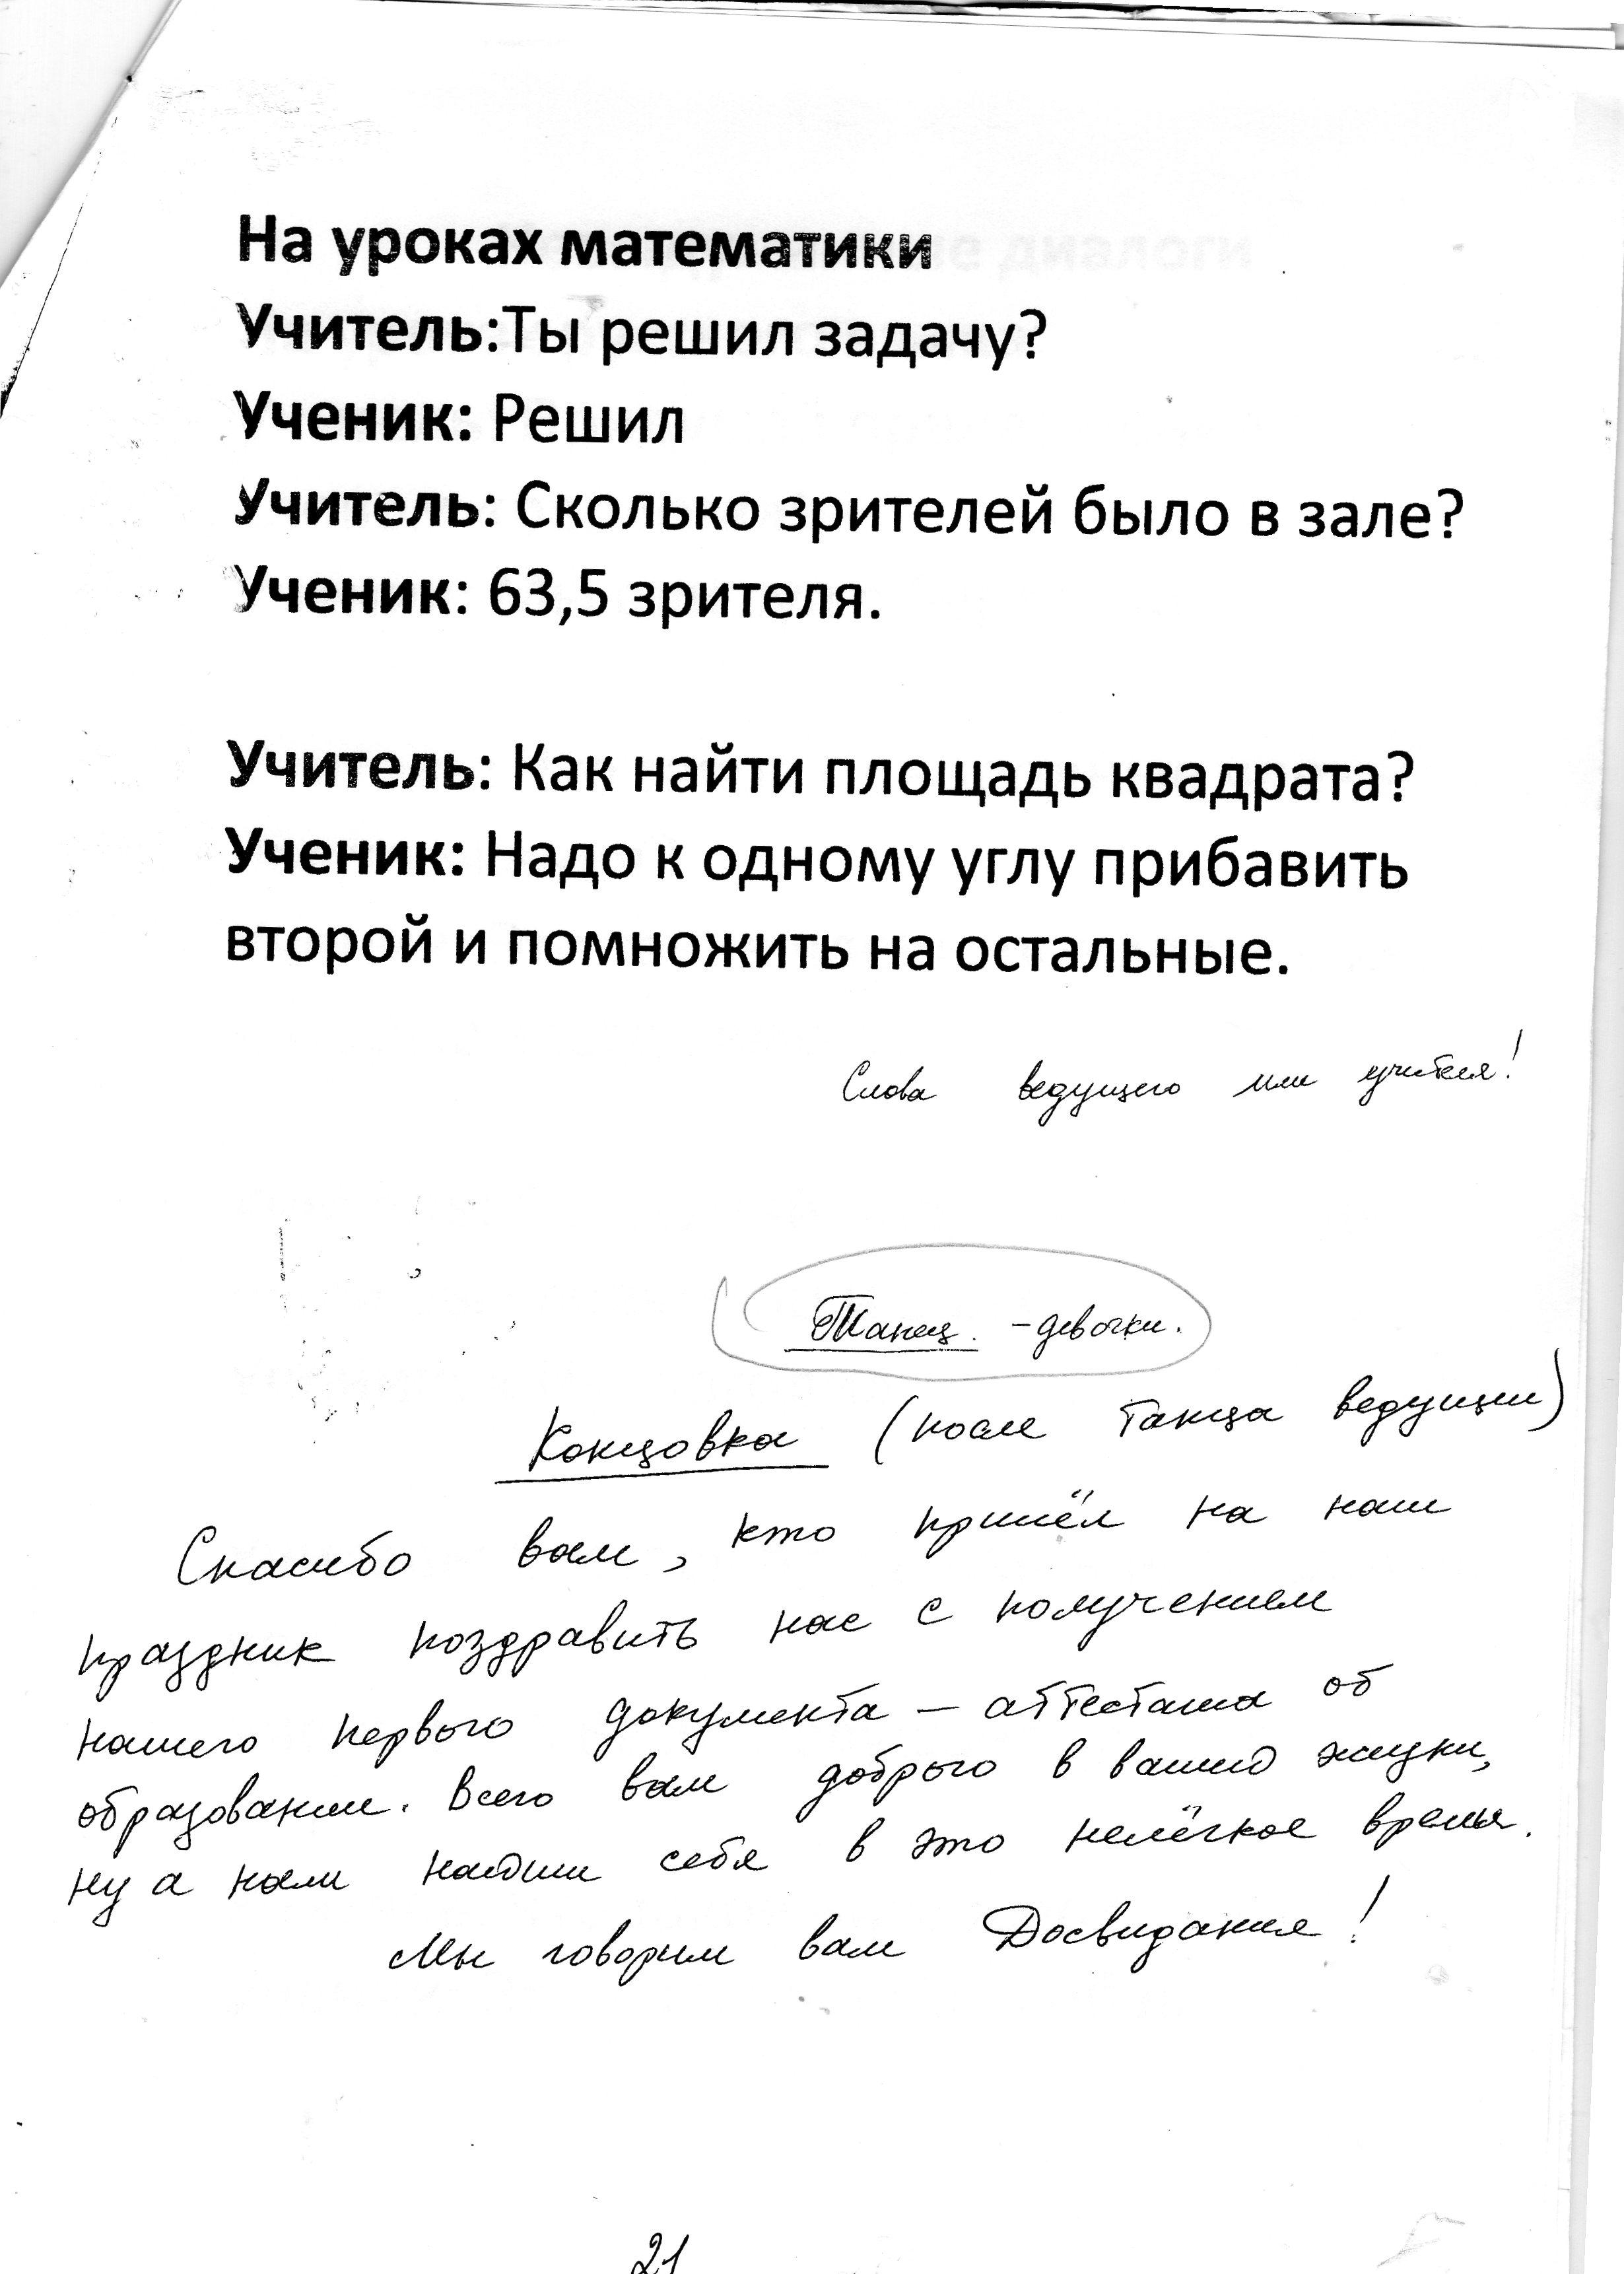 C:\Documents and Settings\ADMIN\Мои документы\9 кл выпускной\img029.jpg